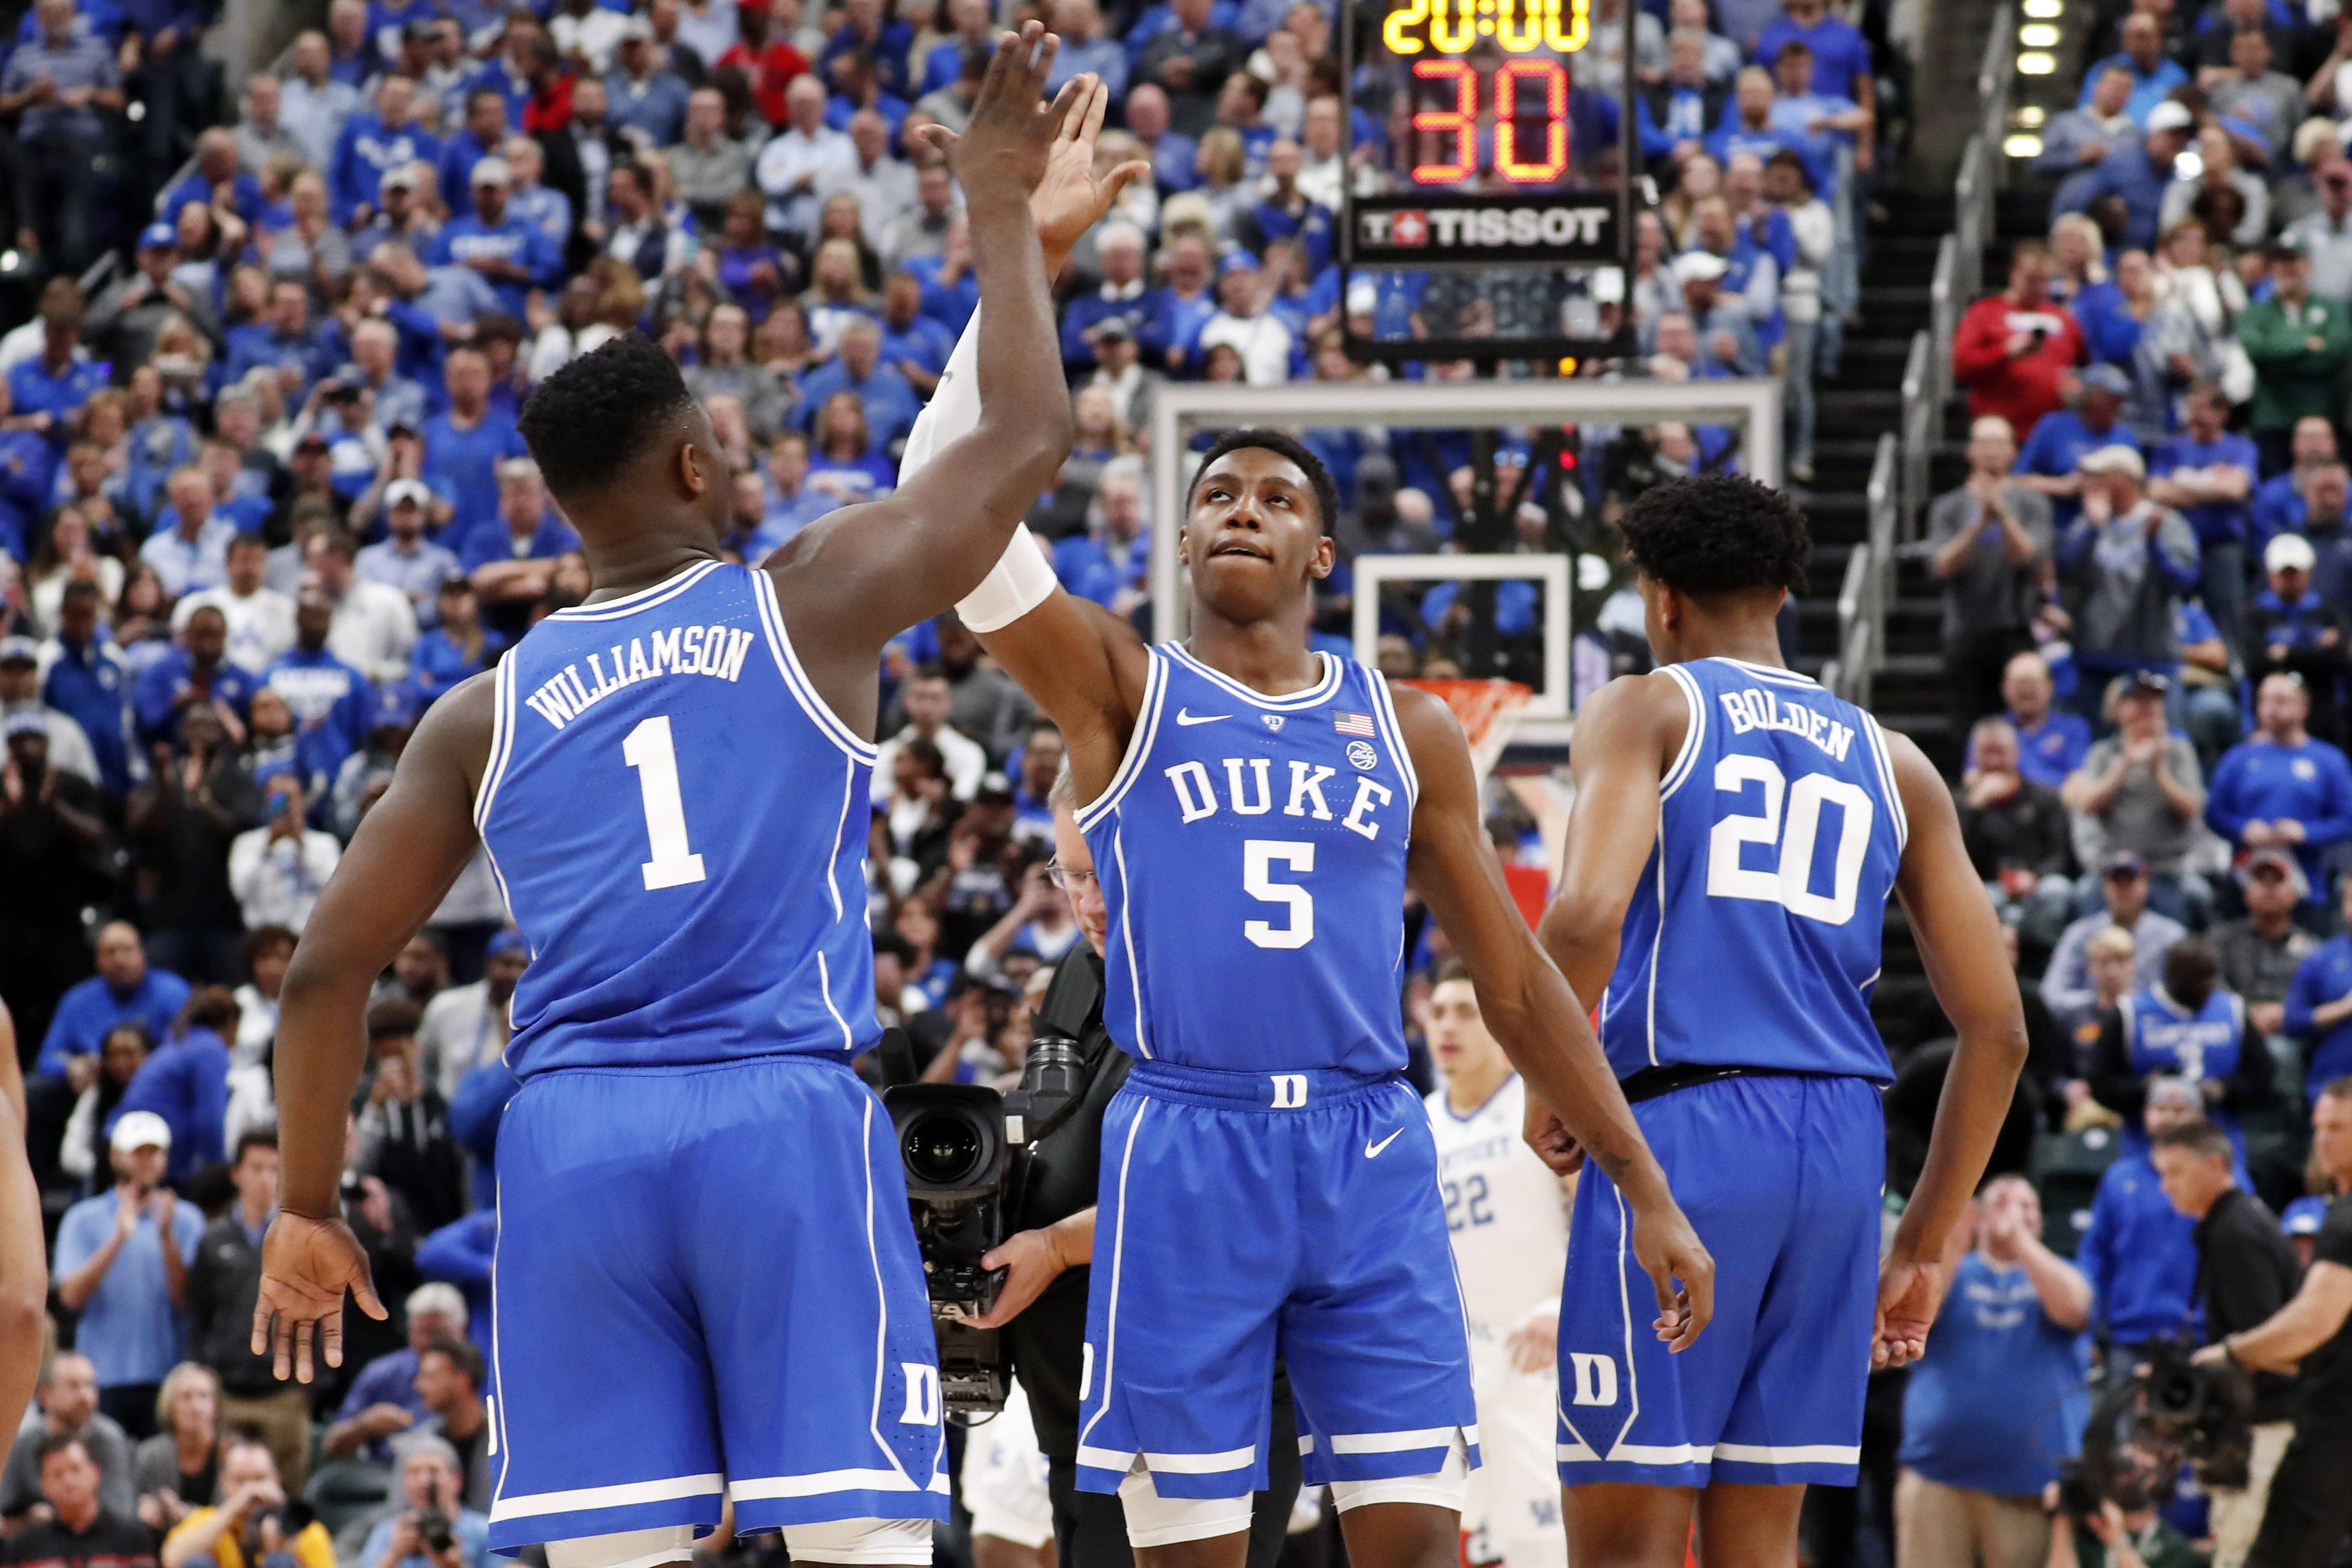 NCAA basketball rankings: Duke jumps to No. 1 after dismantling Kentucky